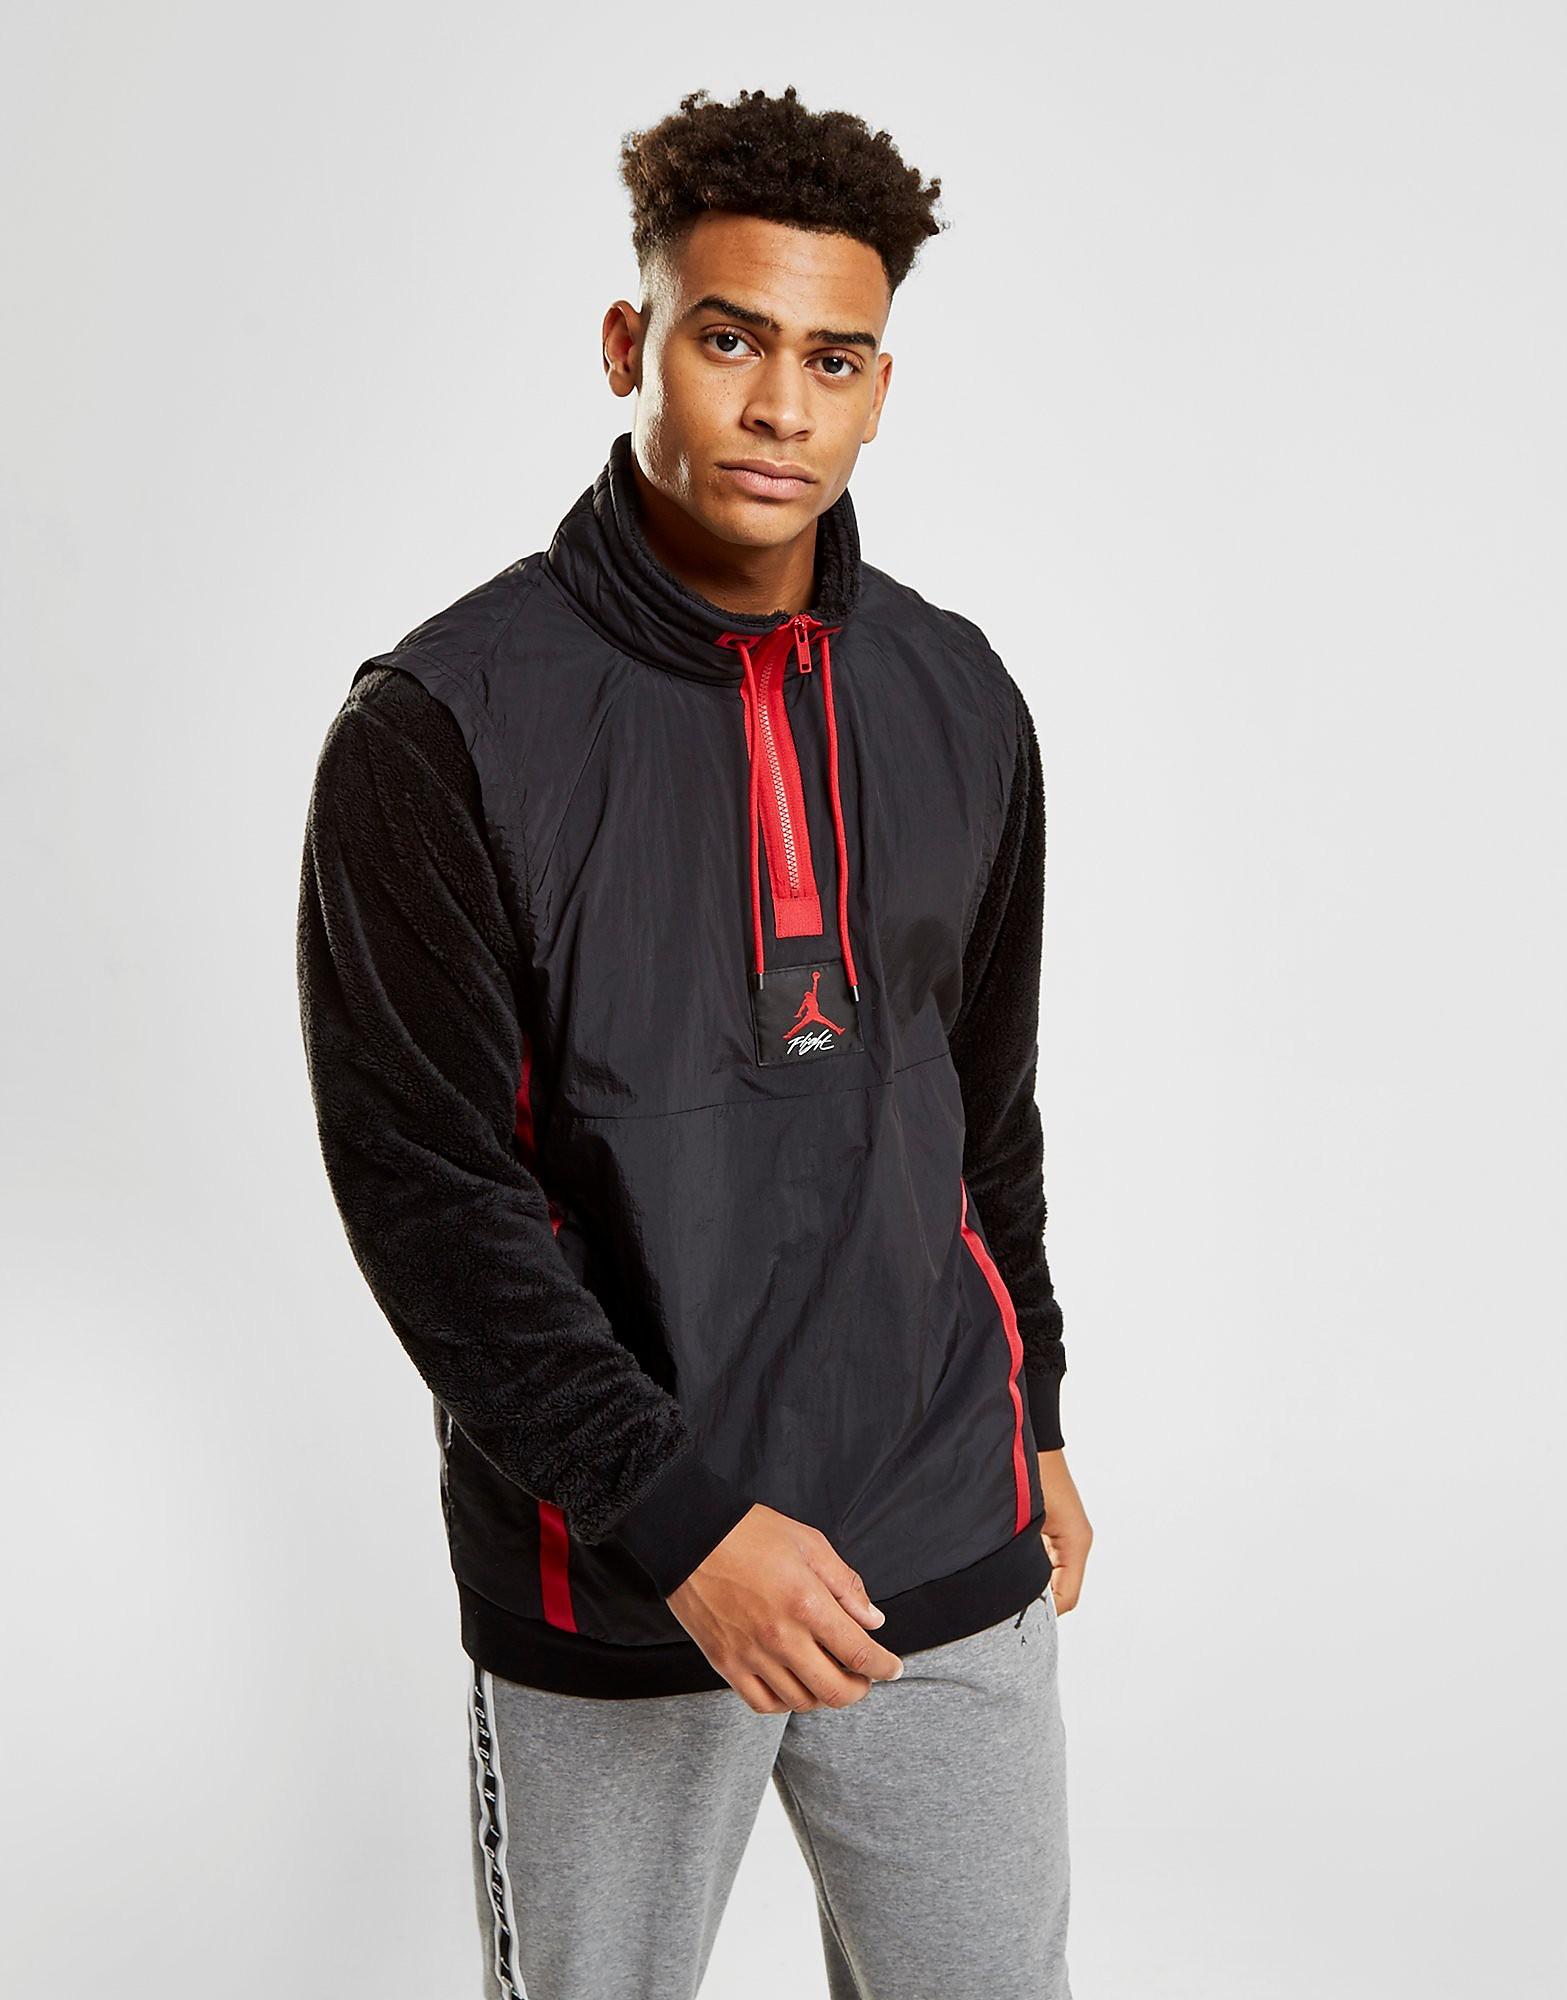 Jordan 1/4 Zip Hybrid Sherpa Sweatshirt - Zwart - Heren